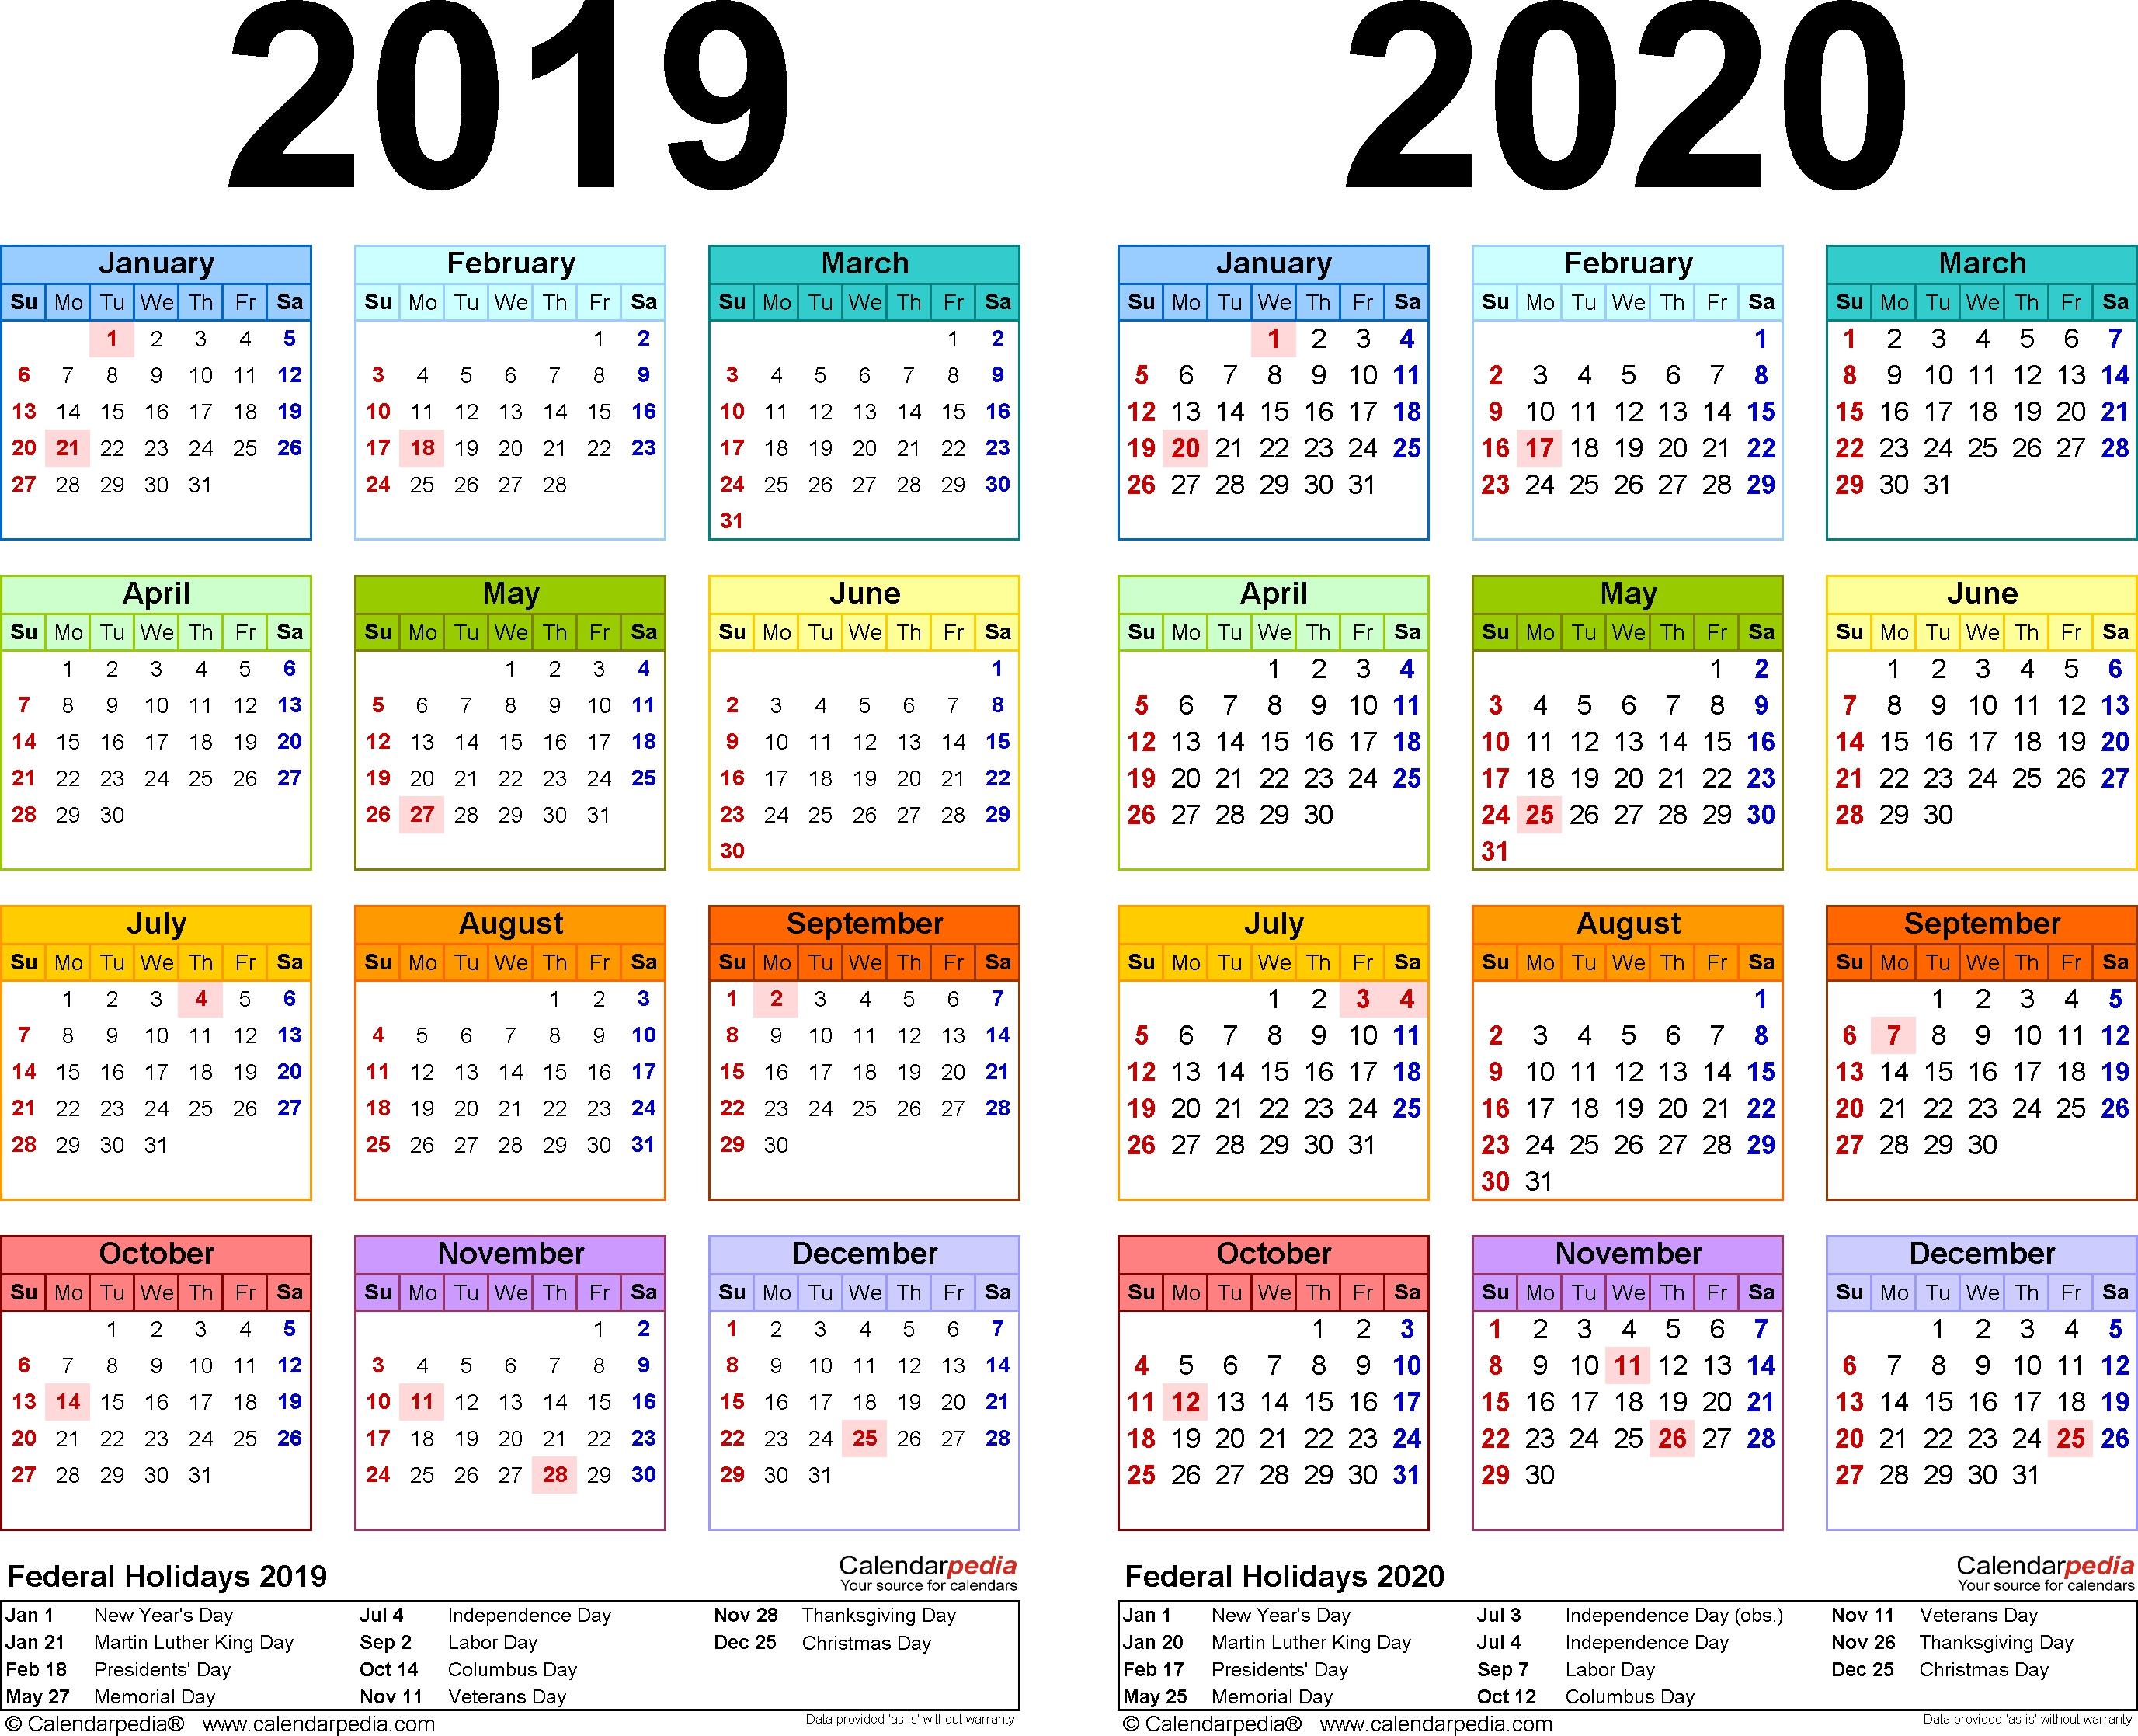 2019-2020 Calendar - Free Printable Two-Year Pdf Calendars-2020-2020 Printable Calendar With No Holidays